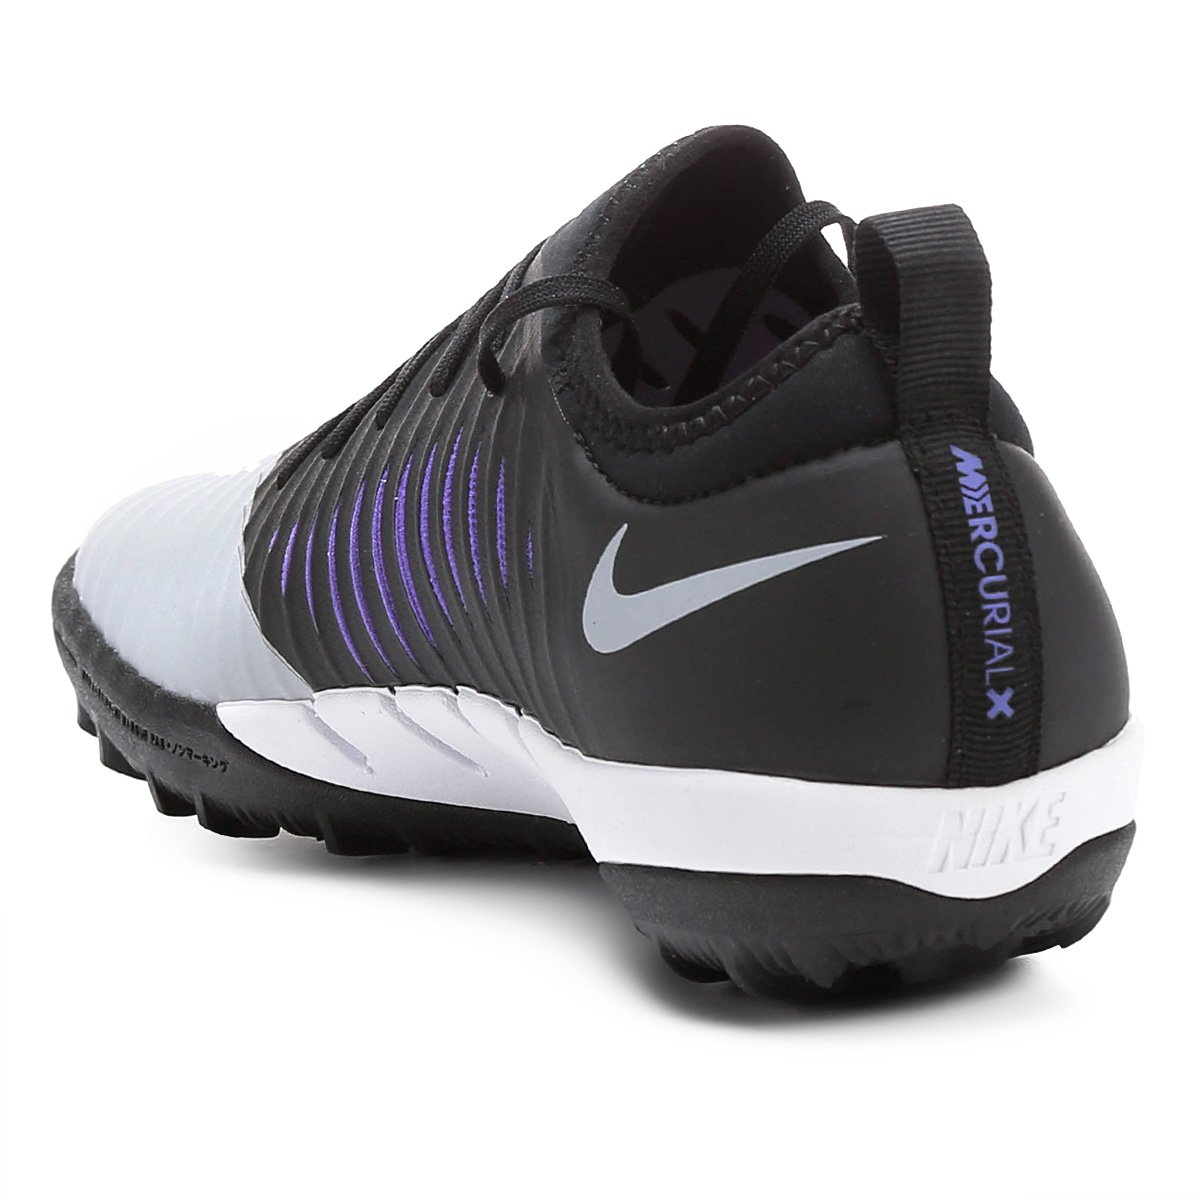 72cd02ba56 Chuteira Society Nike Mercurial Finale 2 TF - Preto e Cinza - Compre ...